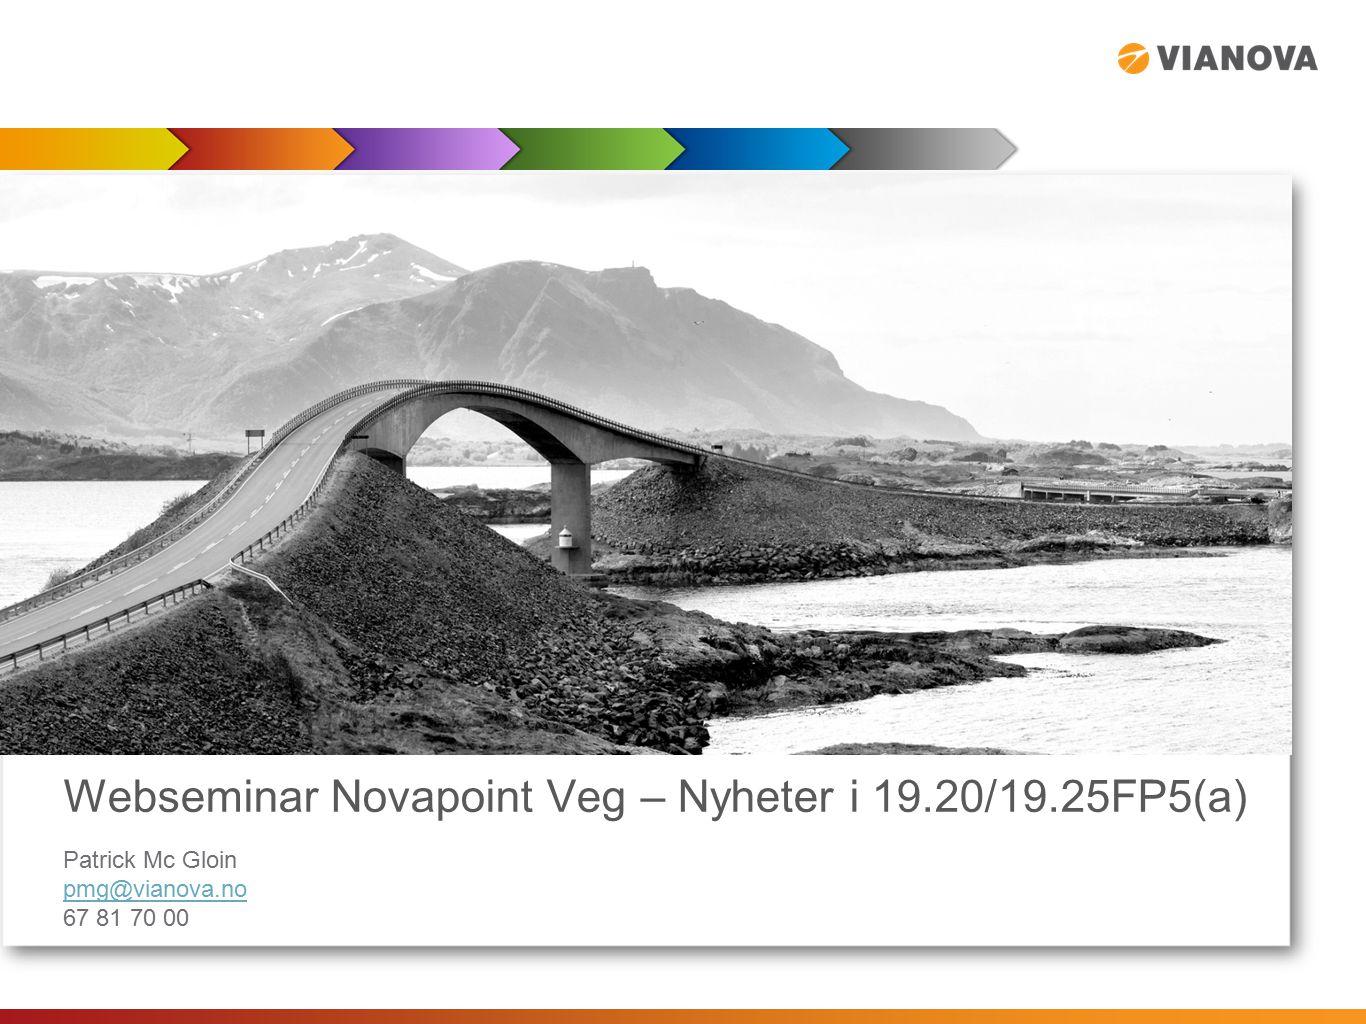 Webseminar Novapoint Veg – Nyheter i 19.20/19.25FP5(a) Patrick Mc Gloin pmg@vianova.no 67 81 70 00 pmg@vianova.no